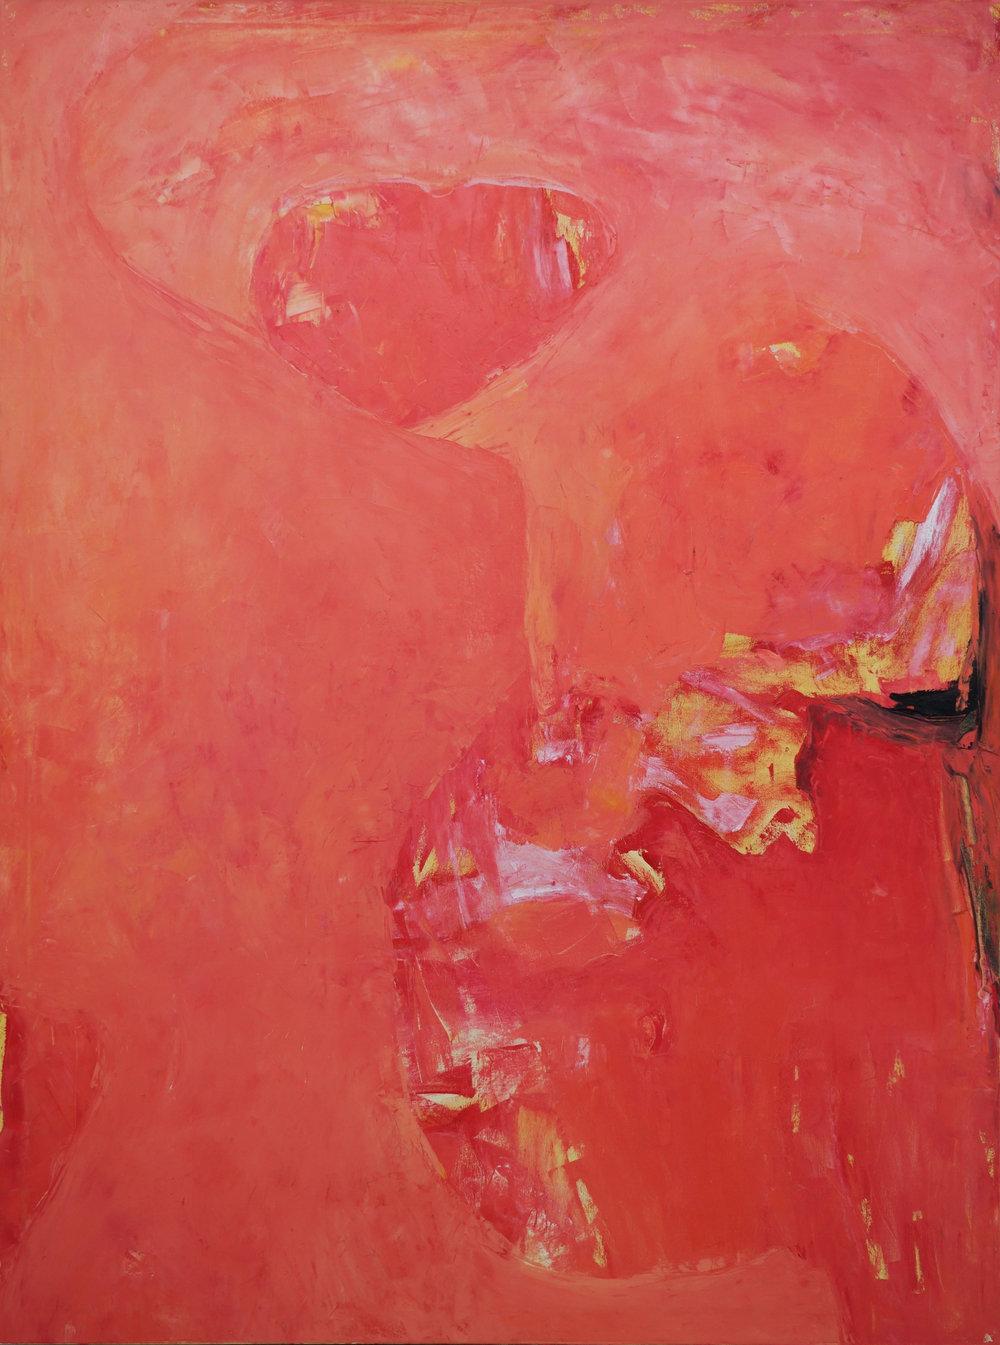 Somyot Hananuntasuk, 2017_16 , 2017, Oil on Canvas, 120 x 160 cm